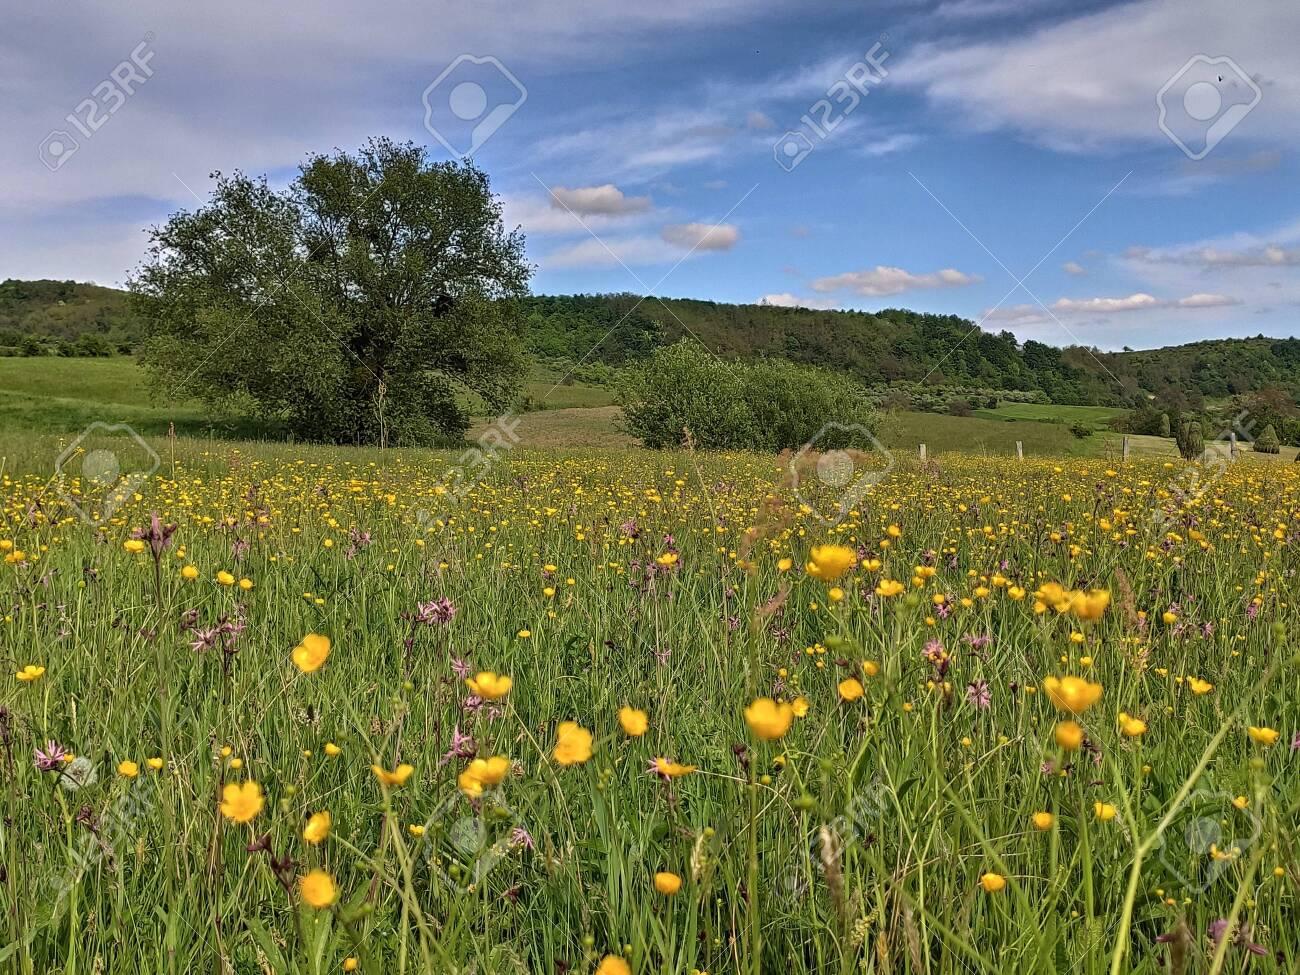 field with flowers in Bistrita Slatinita, ROMANIA, MAY 2020 - 147239819